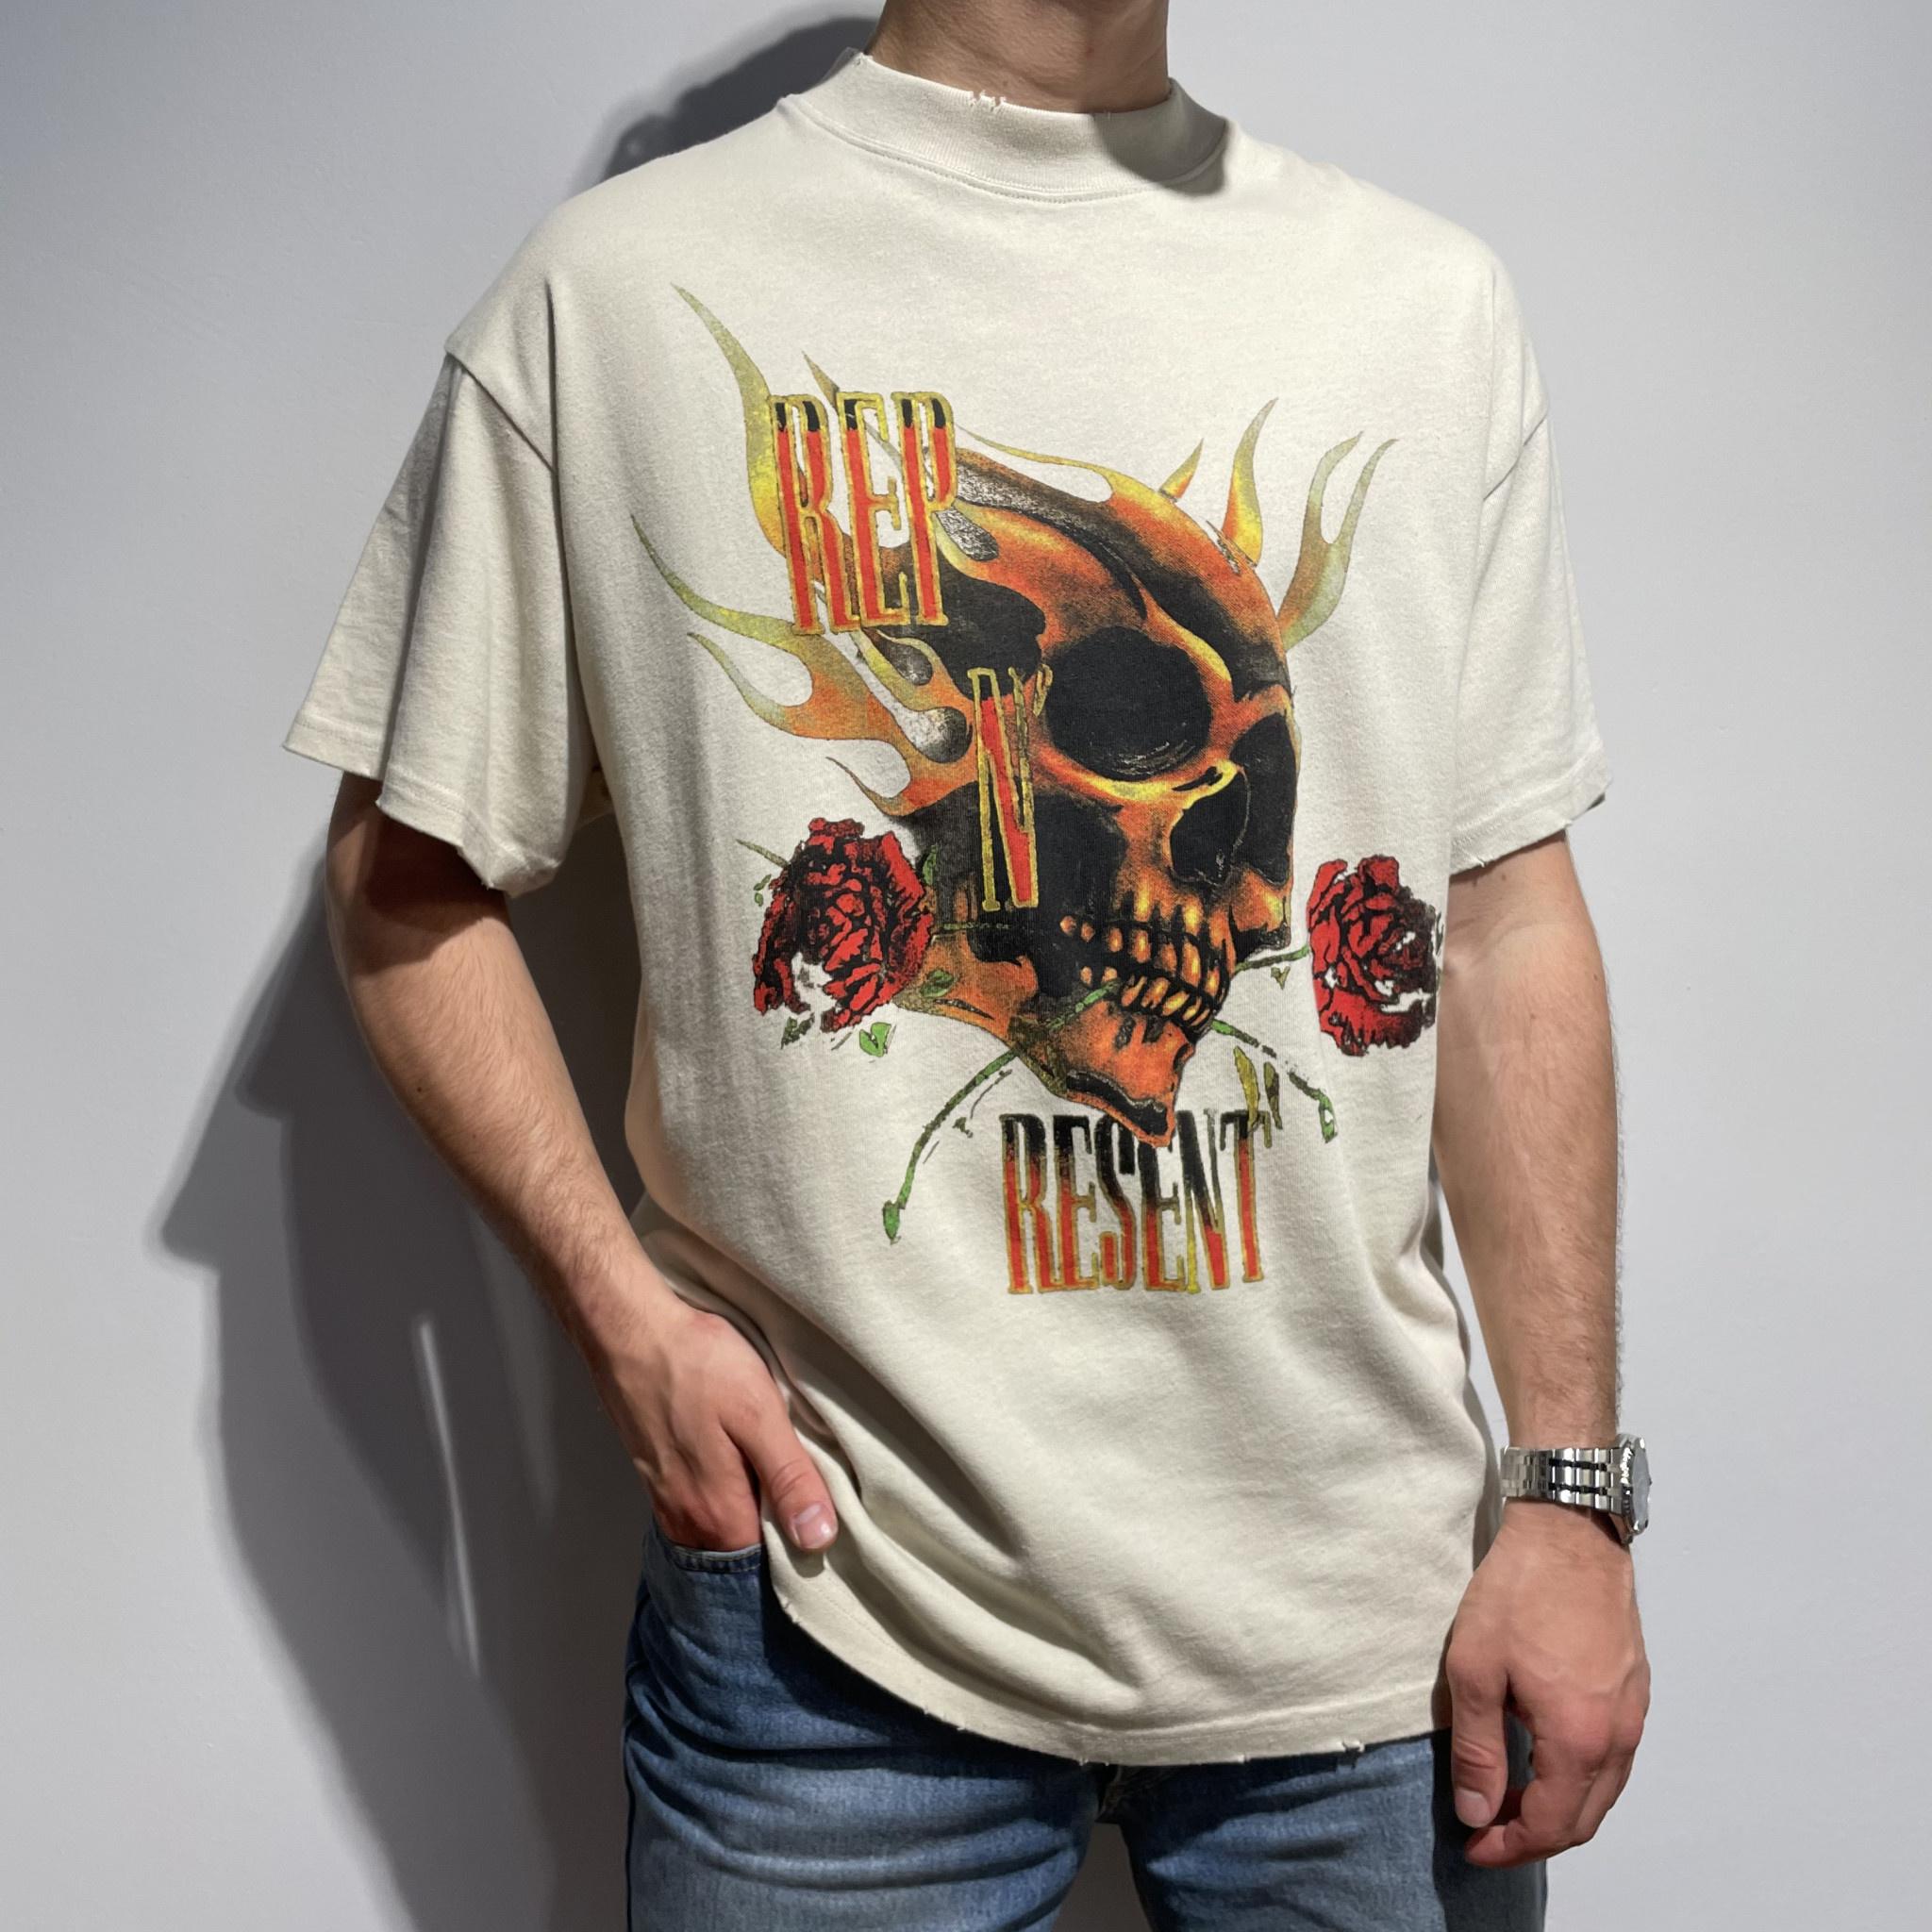 Rep N Resent T Shirt - Vintage White-1